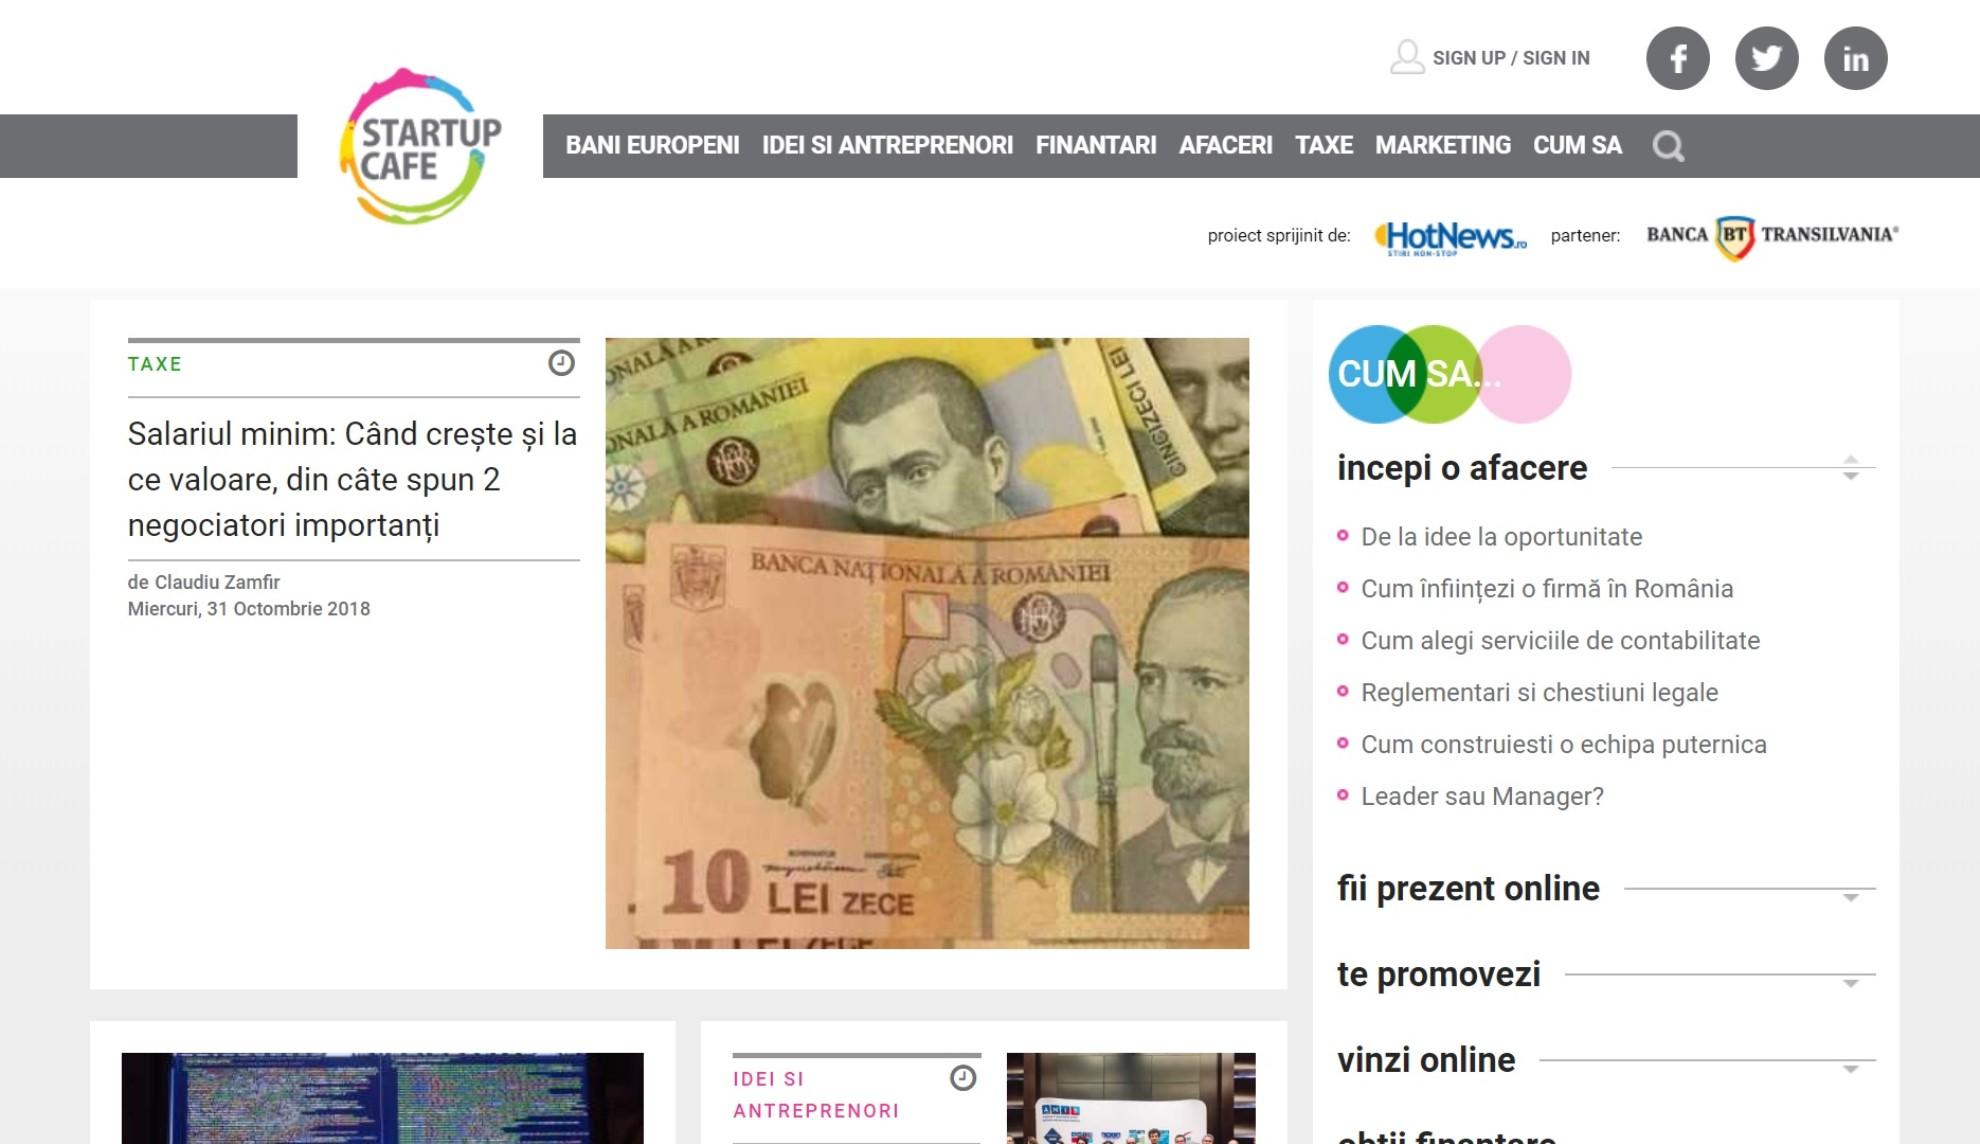 StartupCafe.ro - Stiri si Ghiduri - Antreprenori Idei Finantari Afaceri Taxe Marketing